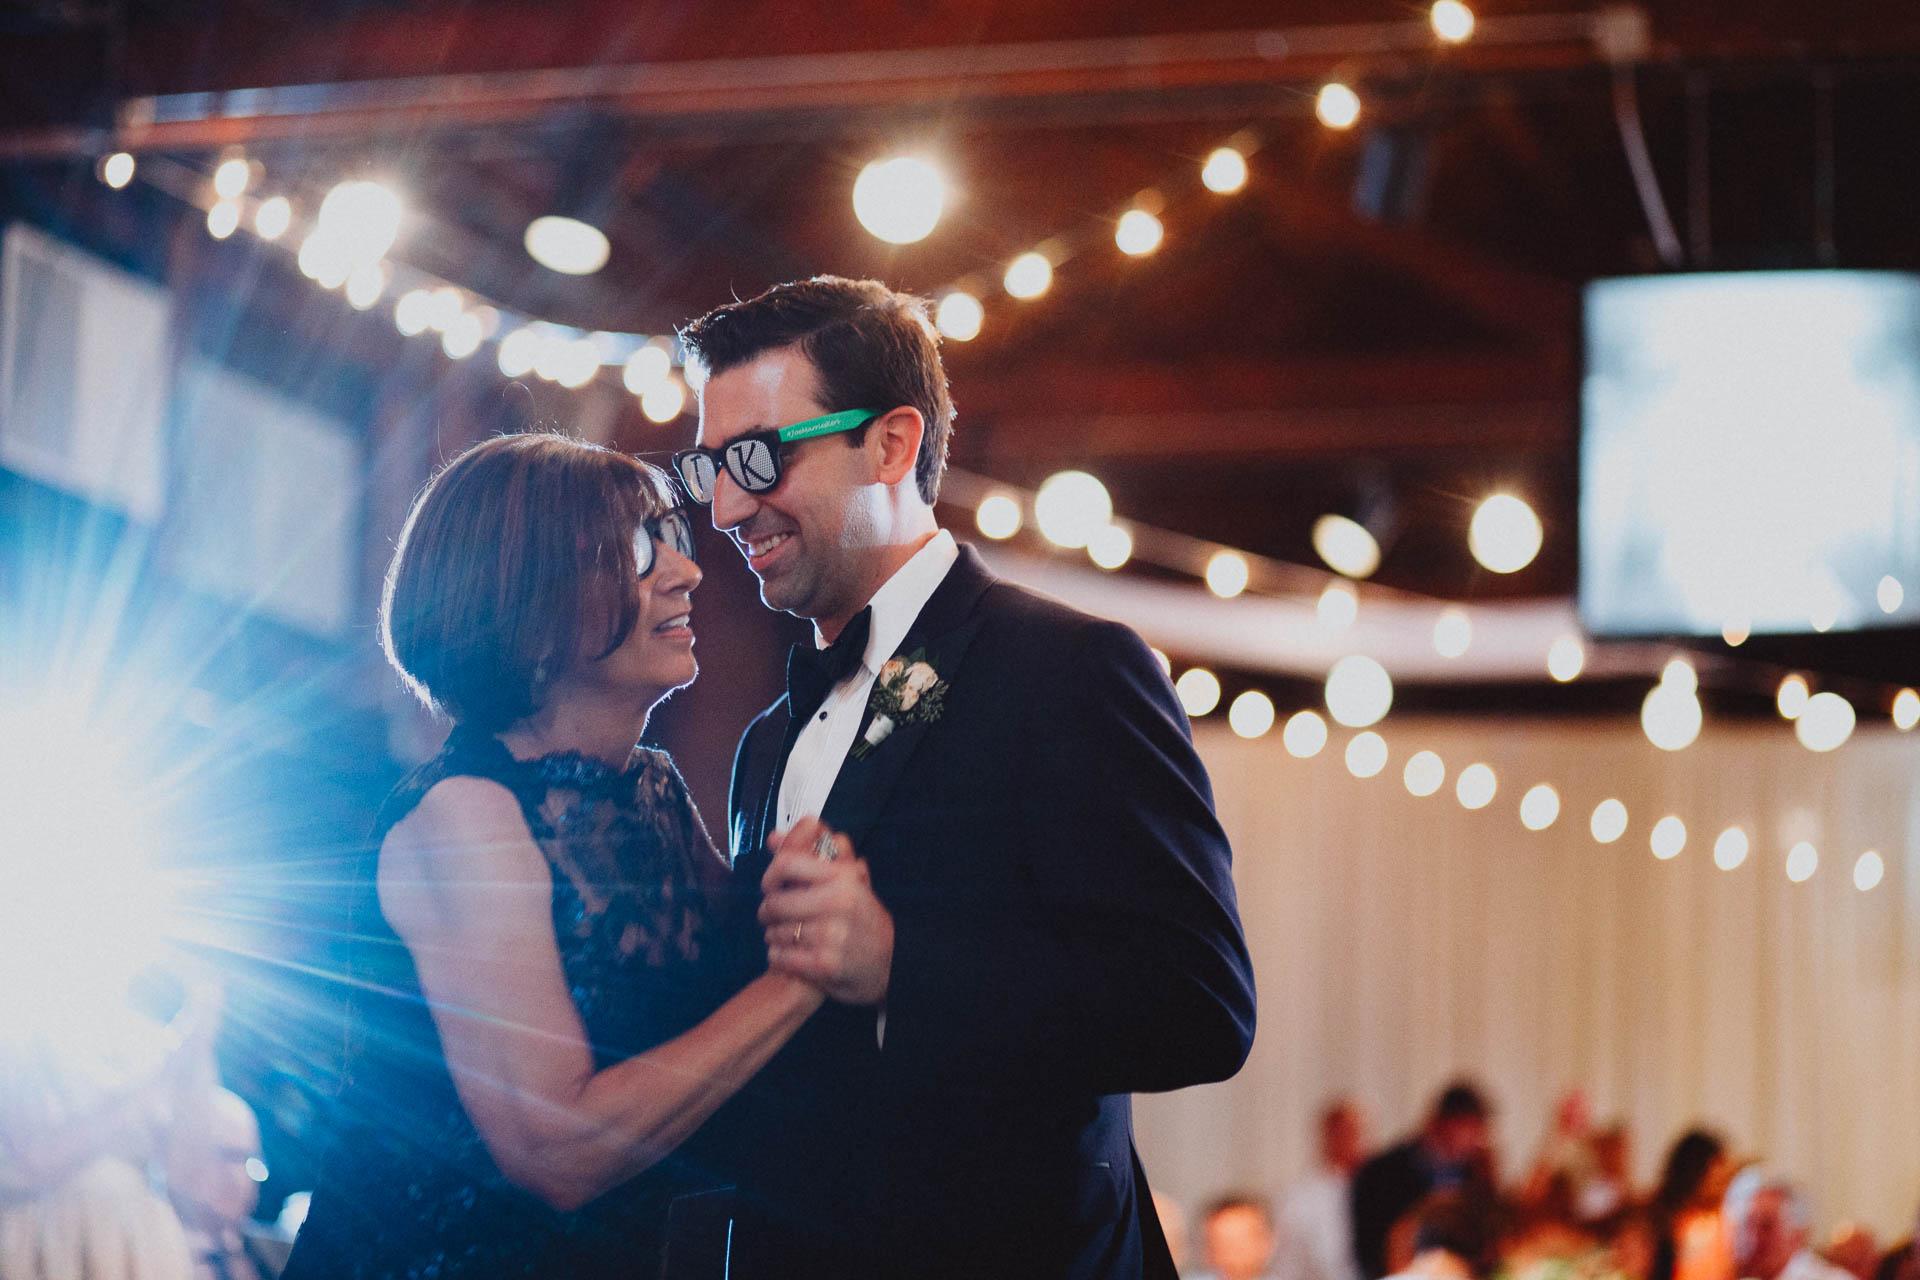 Keri-Joseph-Top-of-the-Market-Wedding-187@2x.jpg